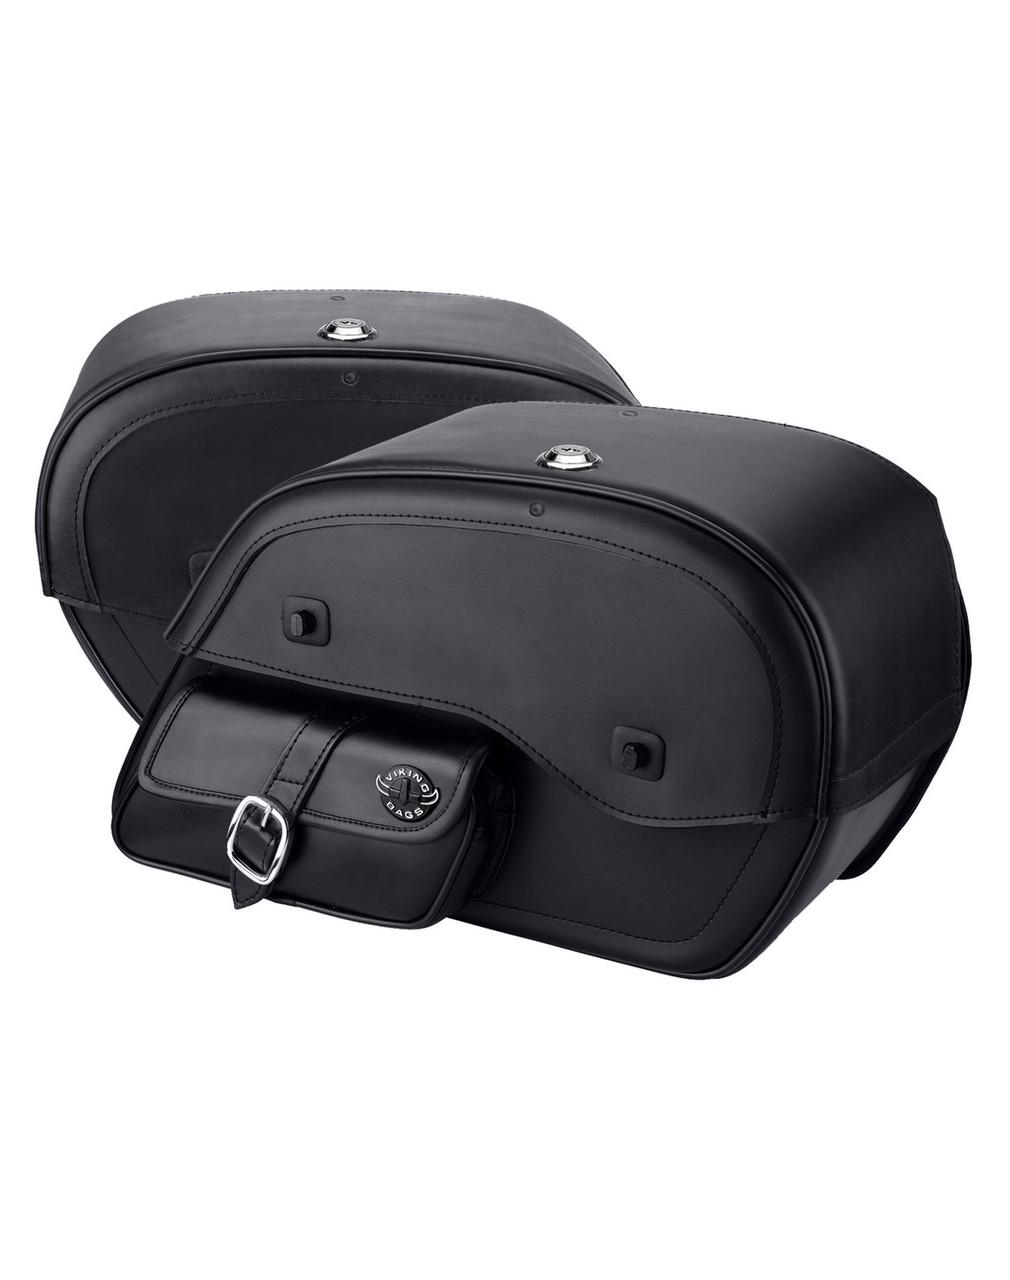 Honda VTX 1300 C Side Pocket Motorcycle Saddlebags Both Bags view